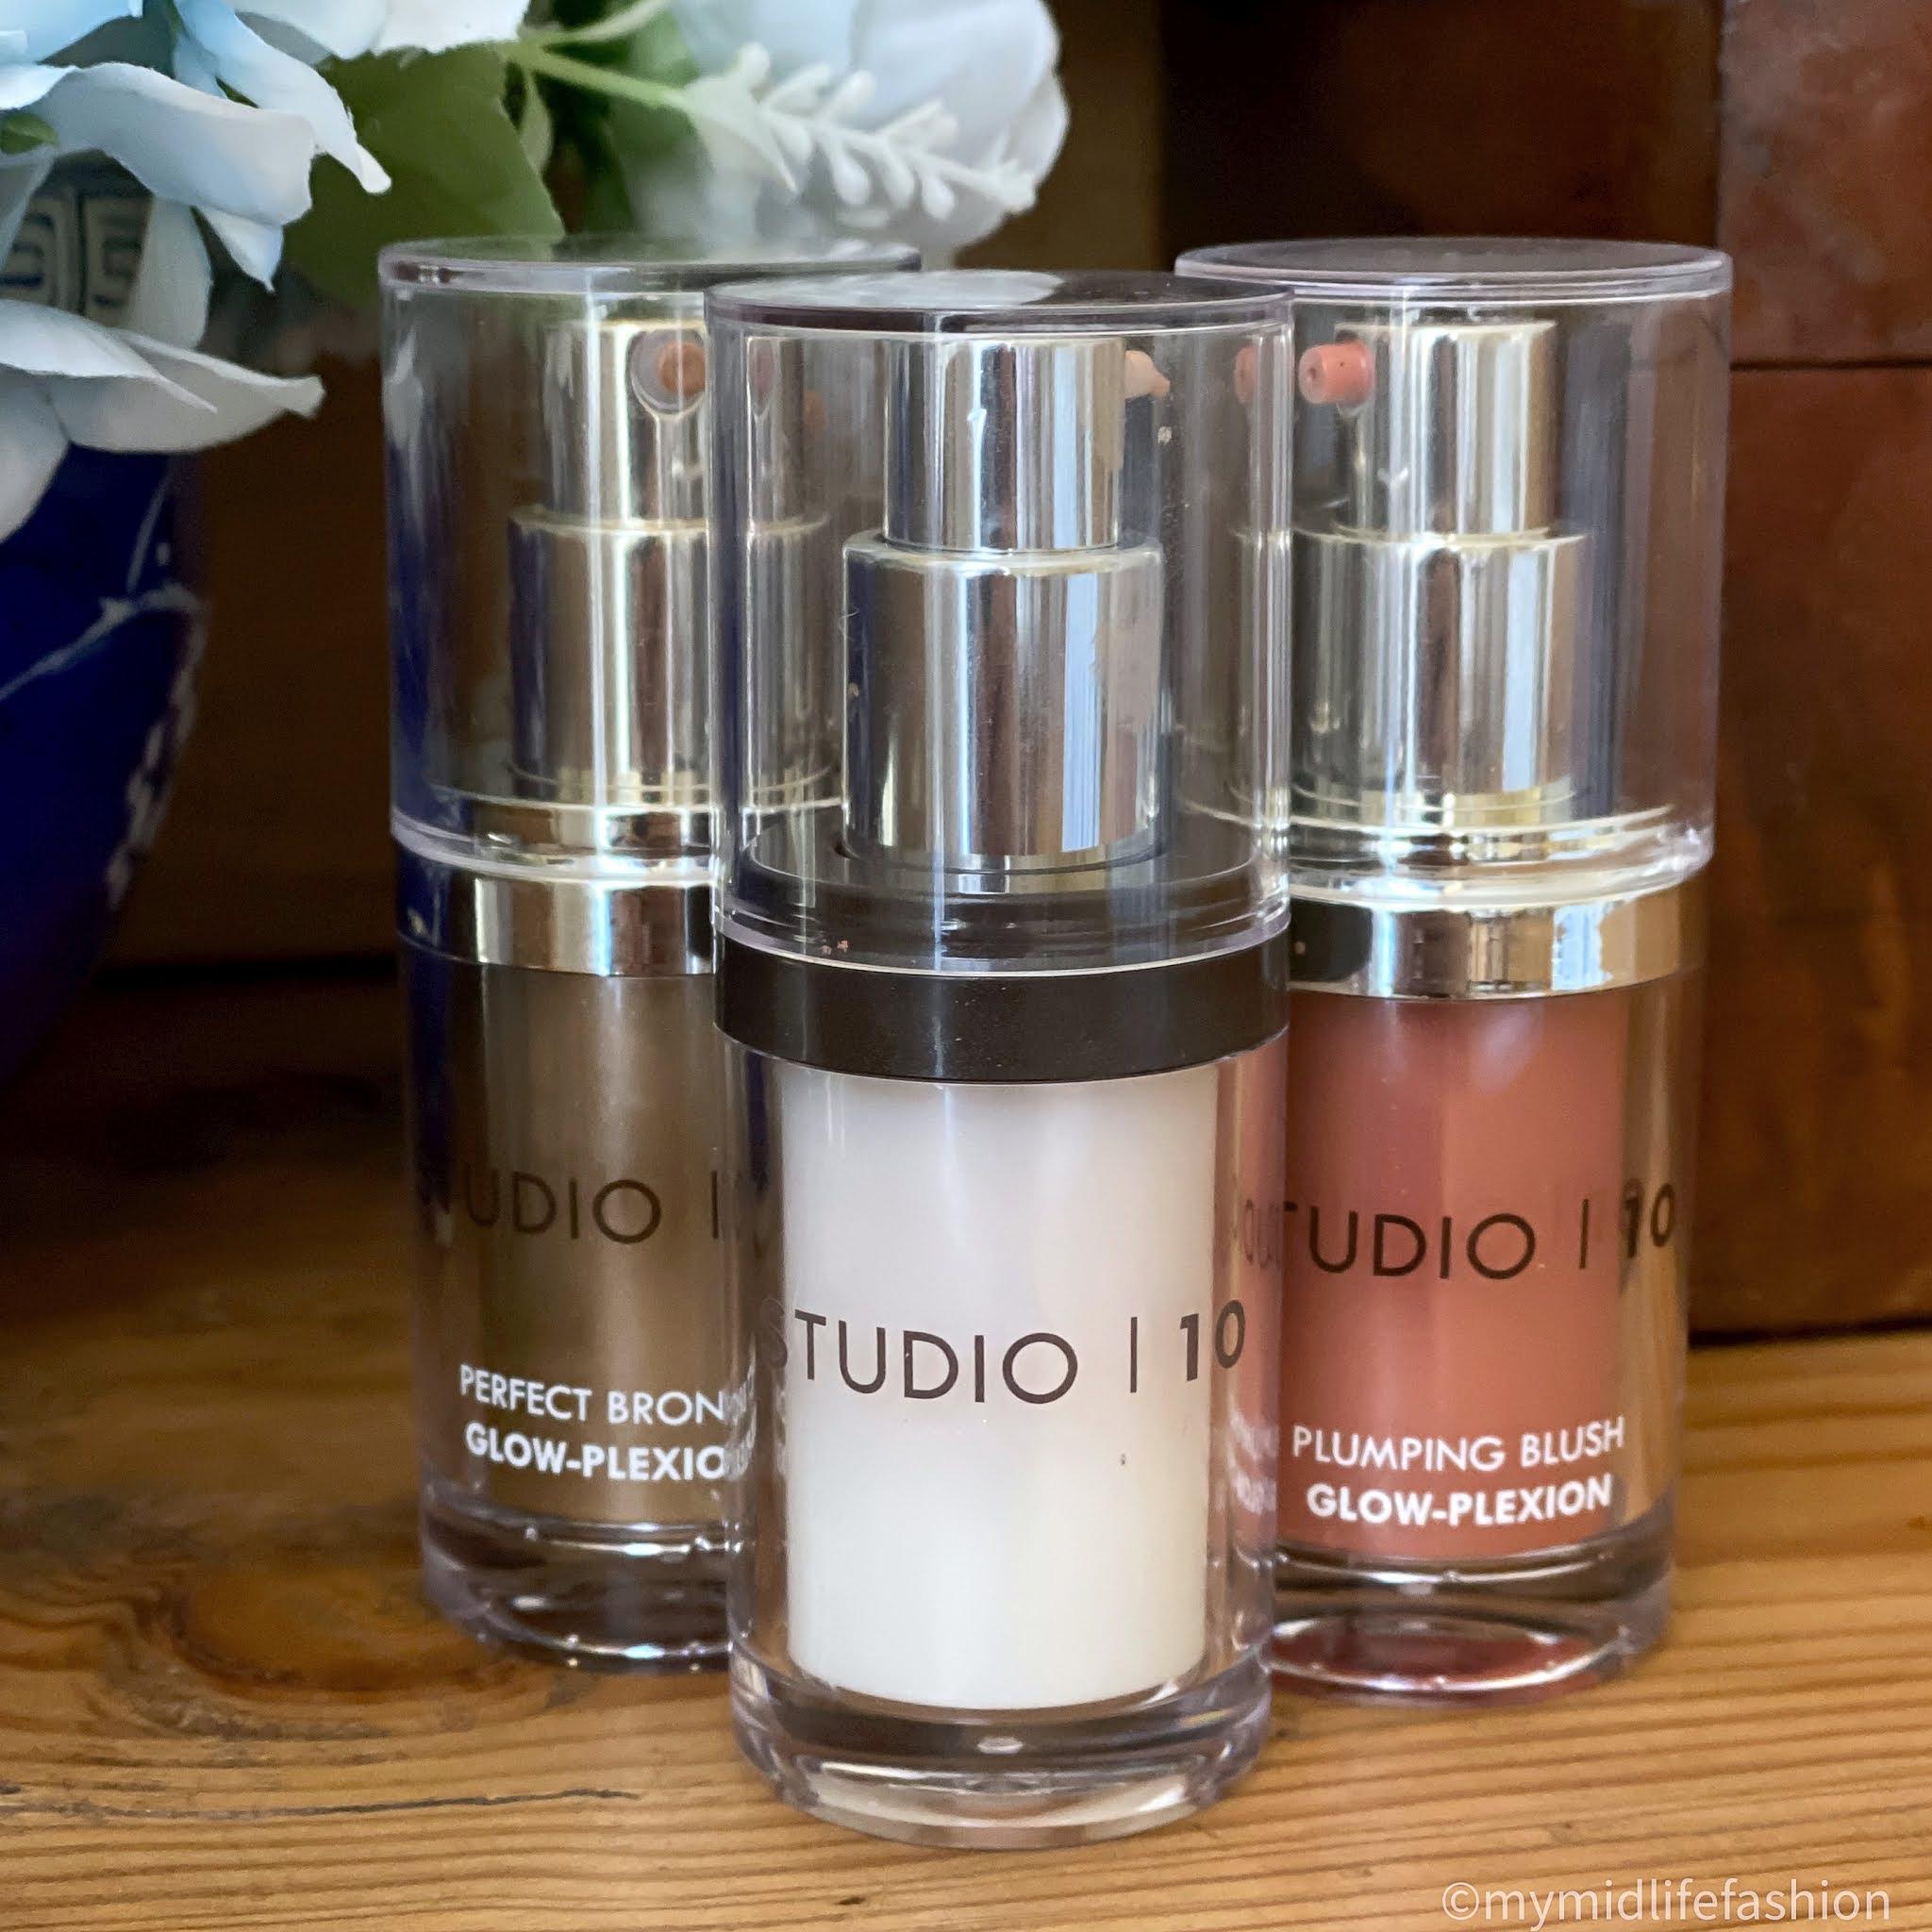 my midlife fashion, studio 10 make up, studio 10, studio 10 perfect bronze glow-plexion, studio 10 youth lift glow-plexion, studio 10 Plumping blush glow-plexion